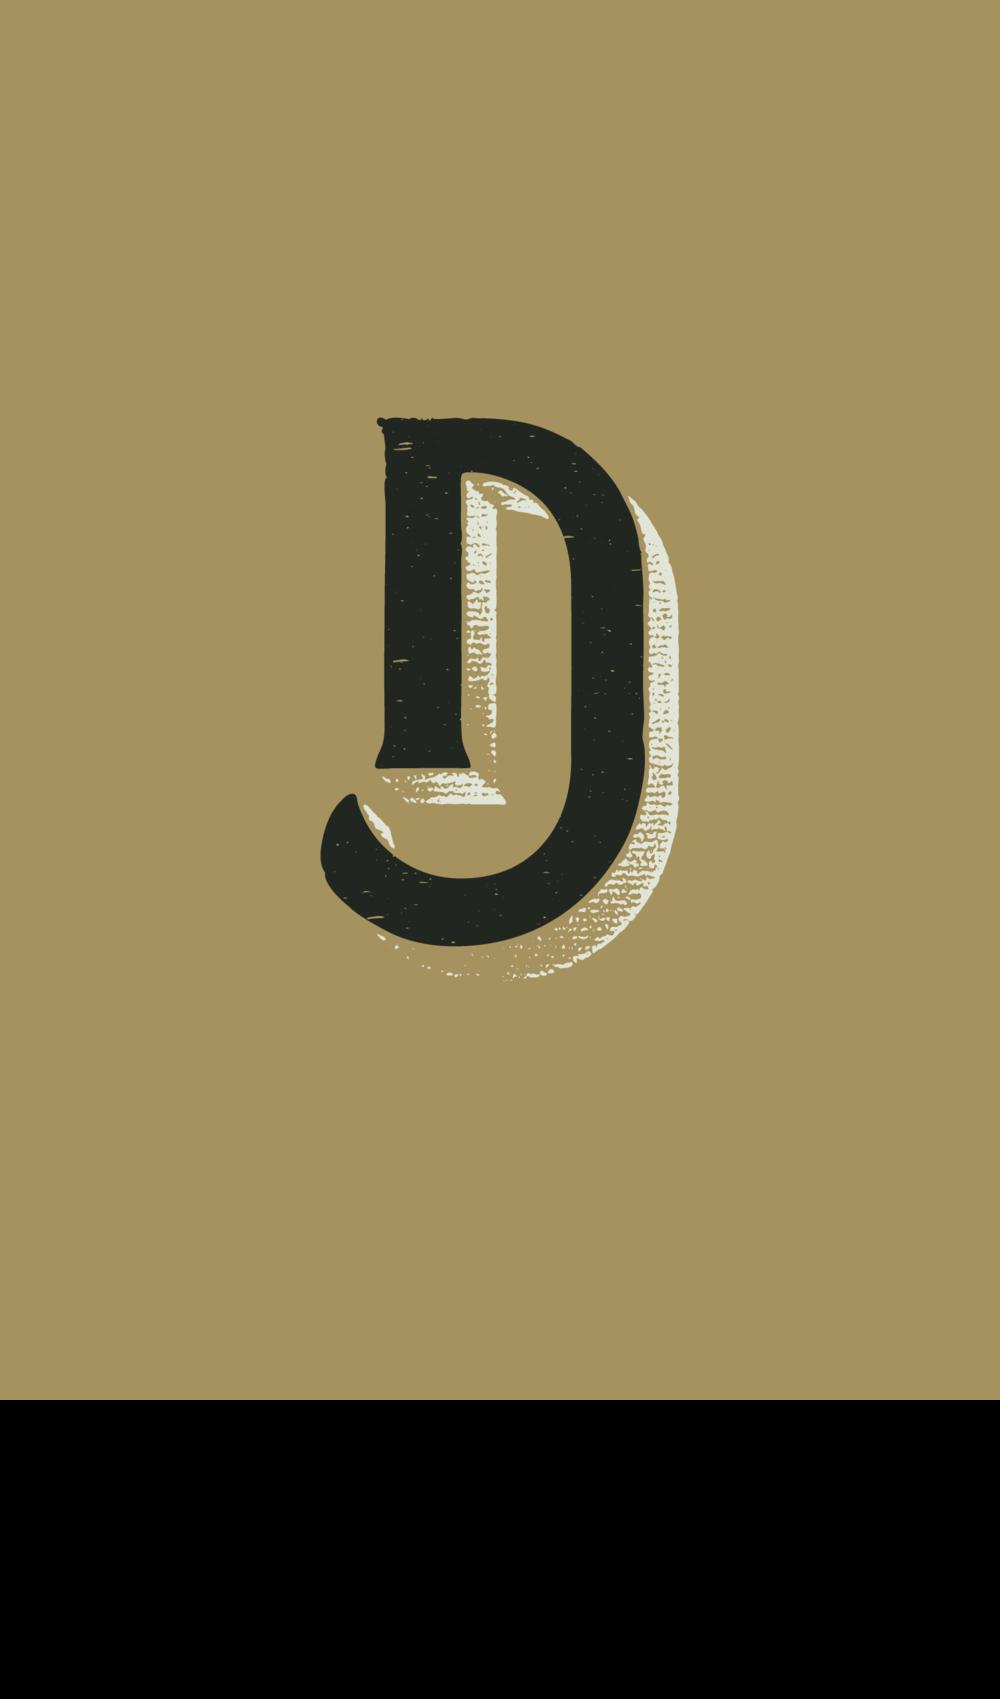 SeeLevel-Portfolio-Brand-02.png